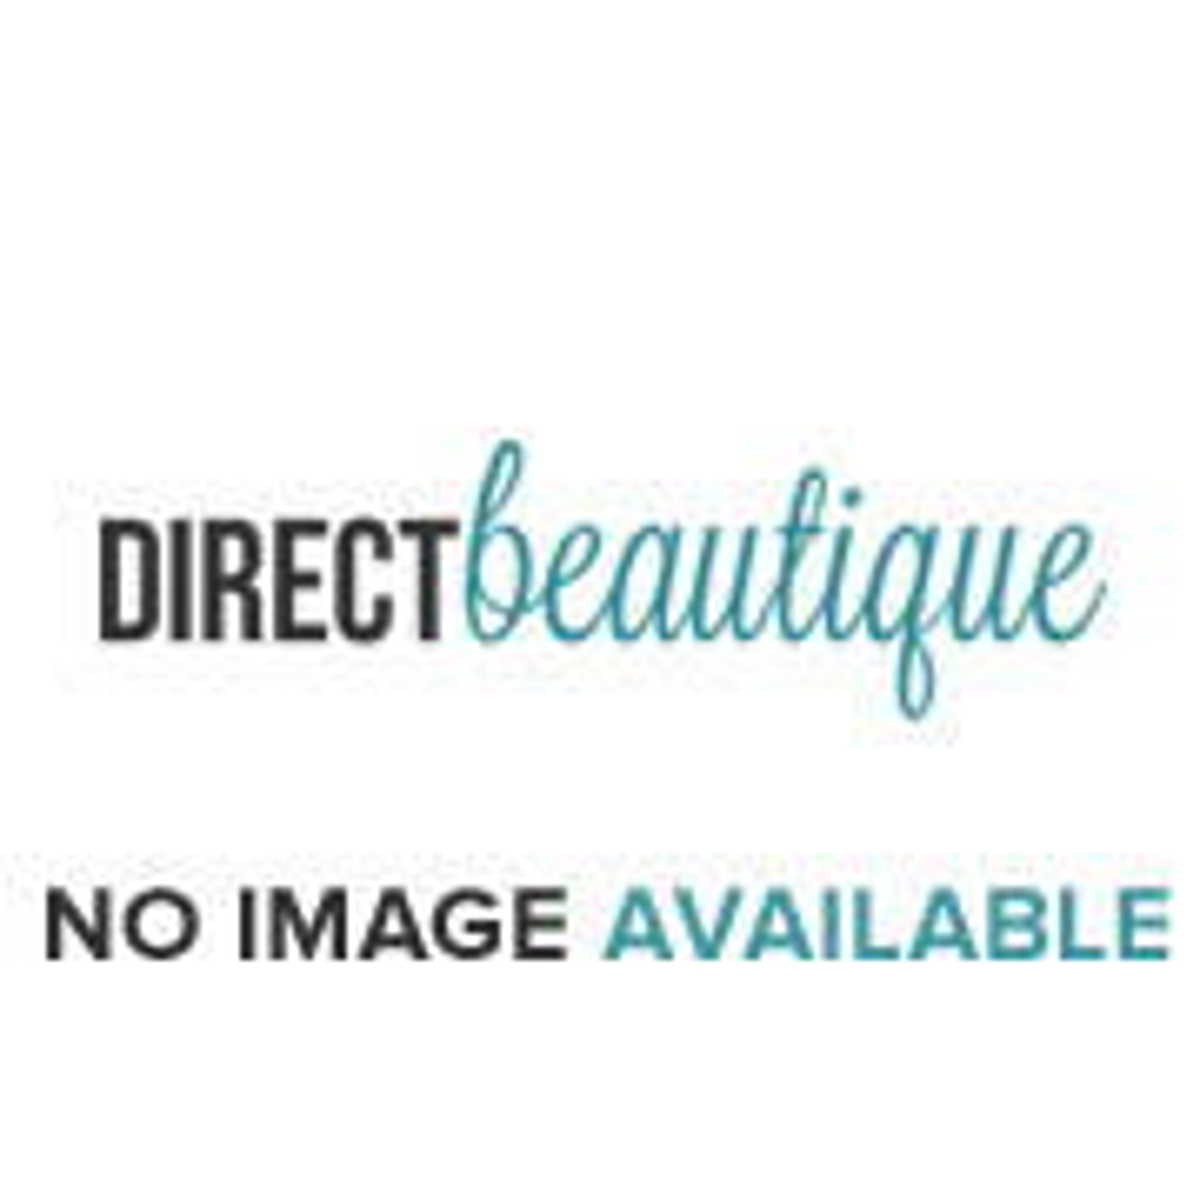 Calvin Klein Be Collector's Bottle 100ml EDT Spray / inc. Magnetic Balls